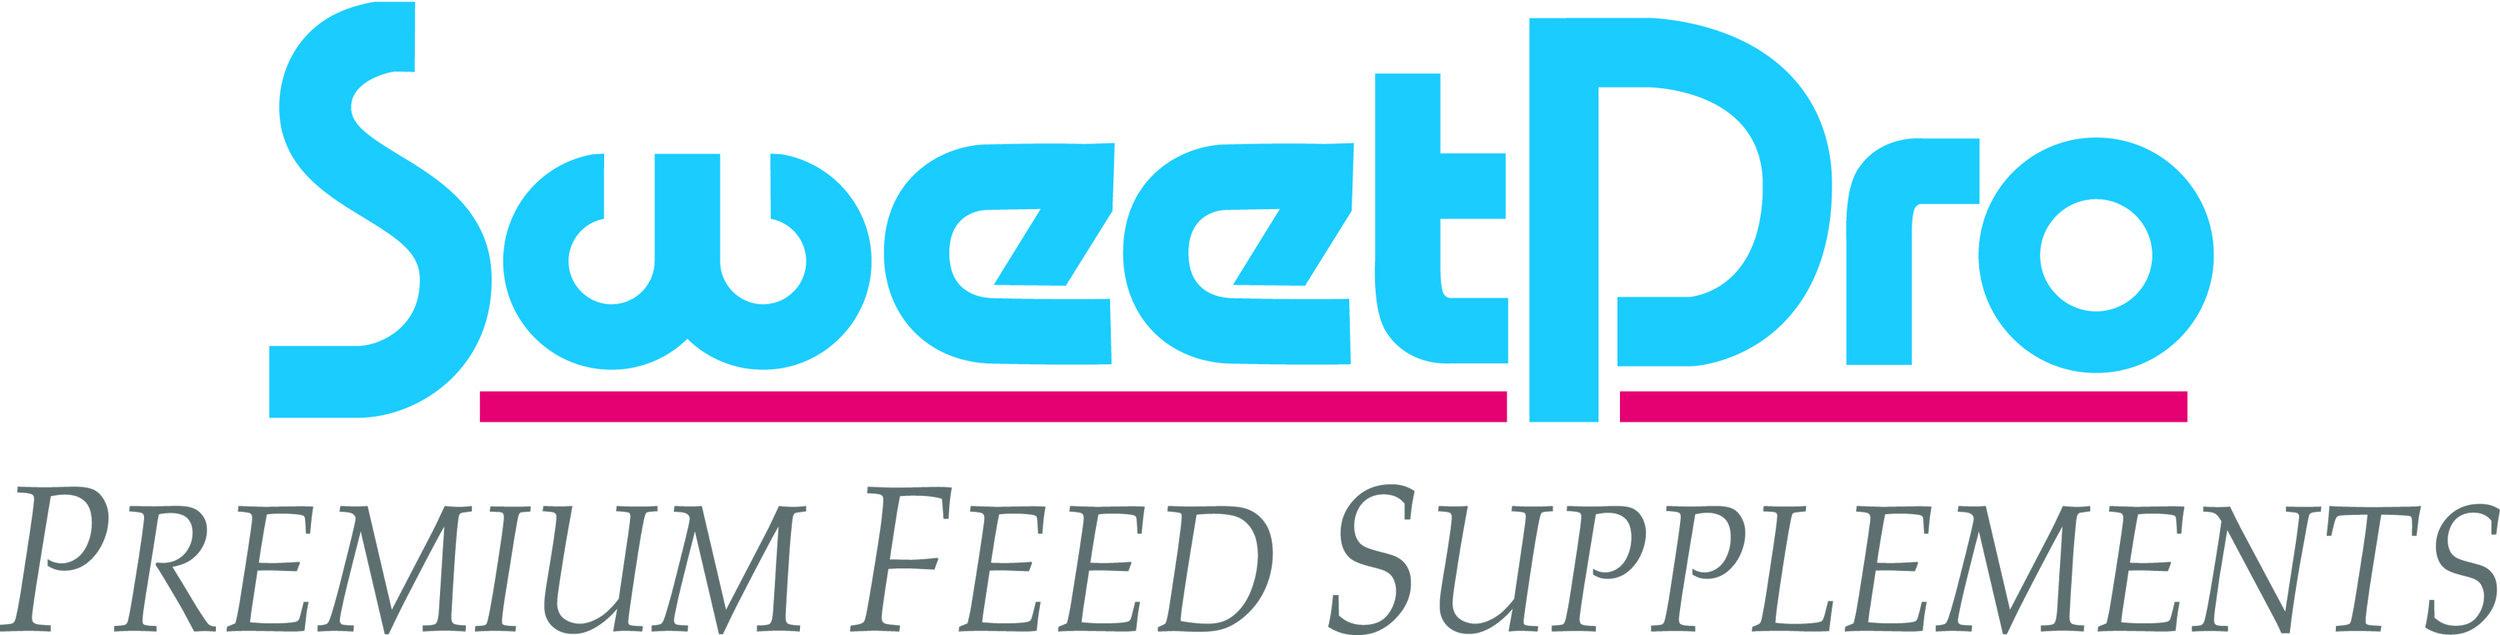 SweetPro Logo 300 DPI.jpg